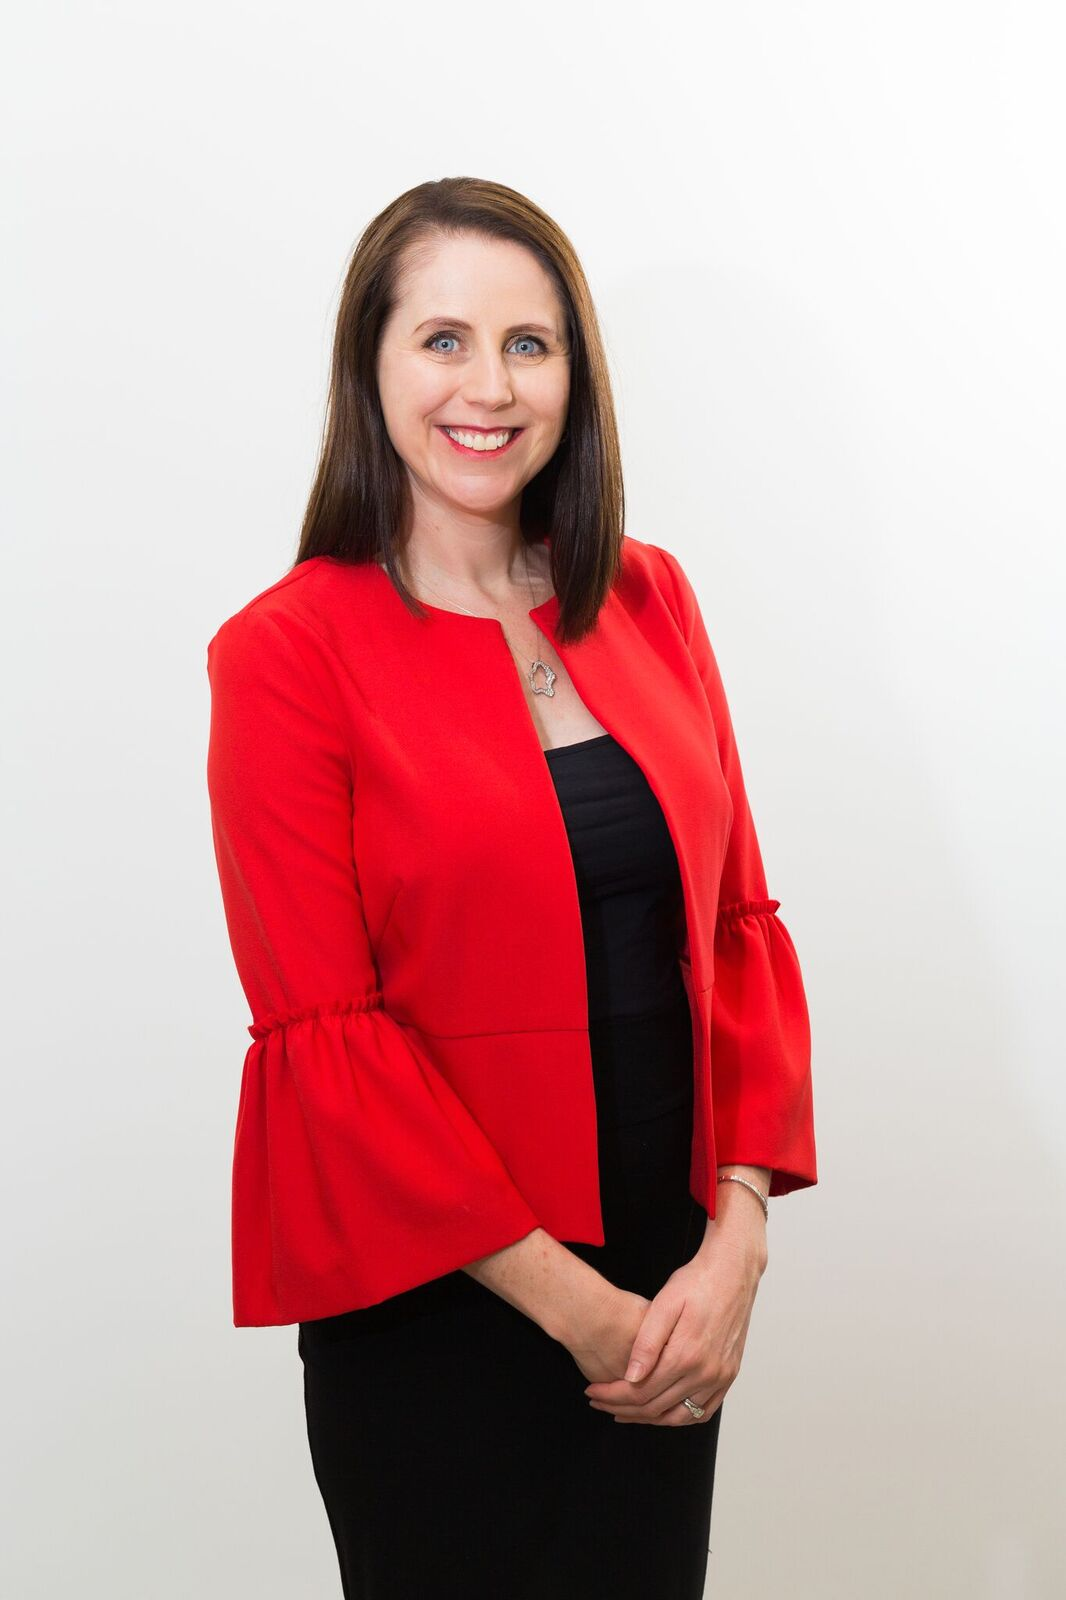 Tina Martino Portrait.jpeg